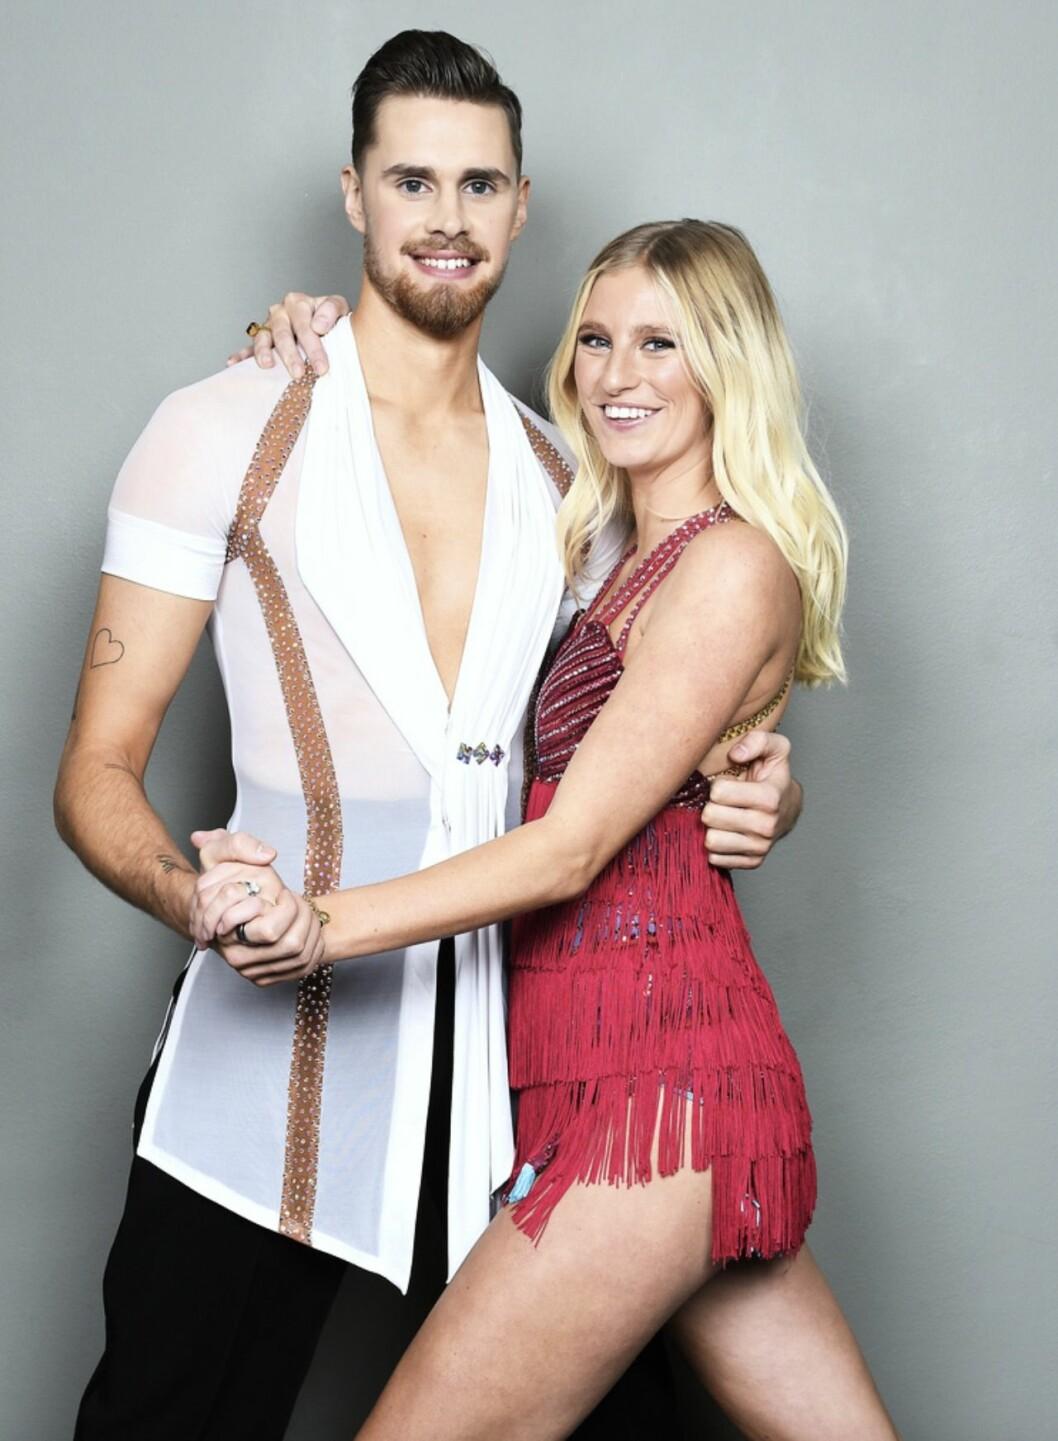 Penny Parnevik tillsammans med danspartnern Jacob Persson